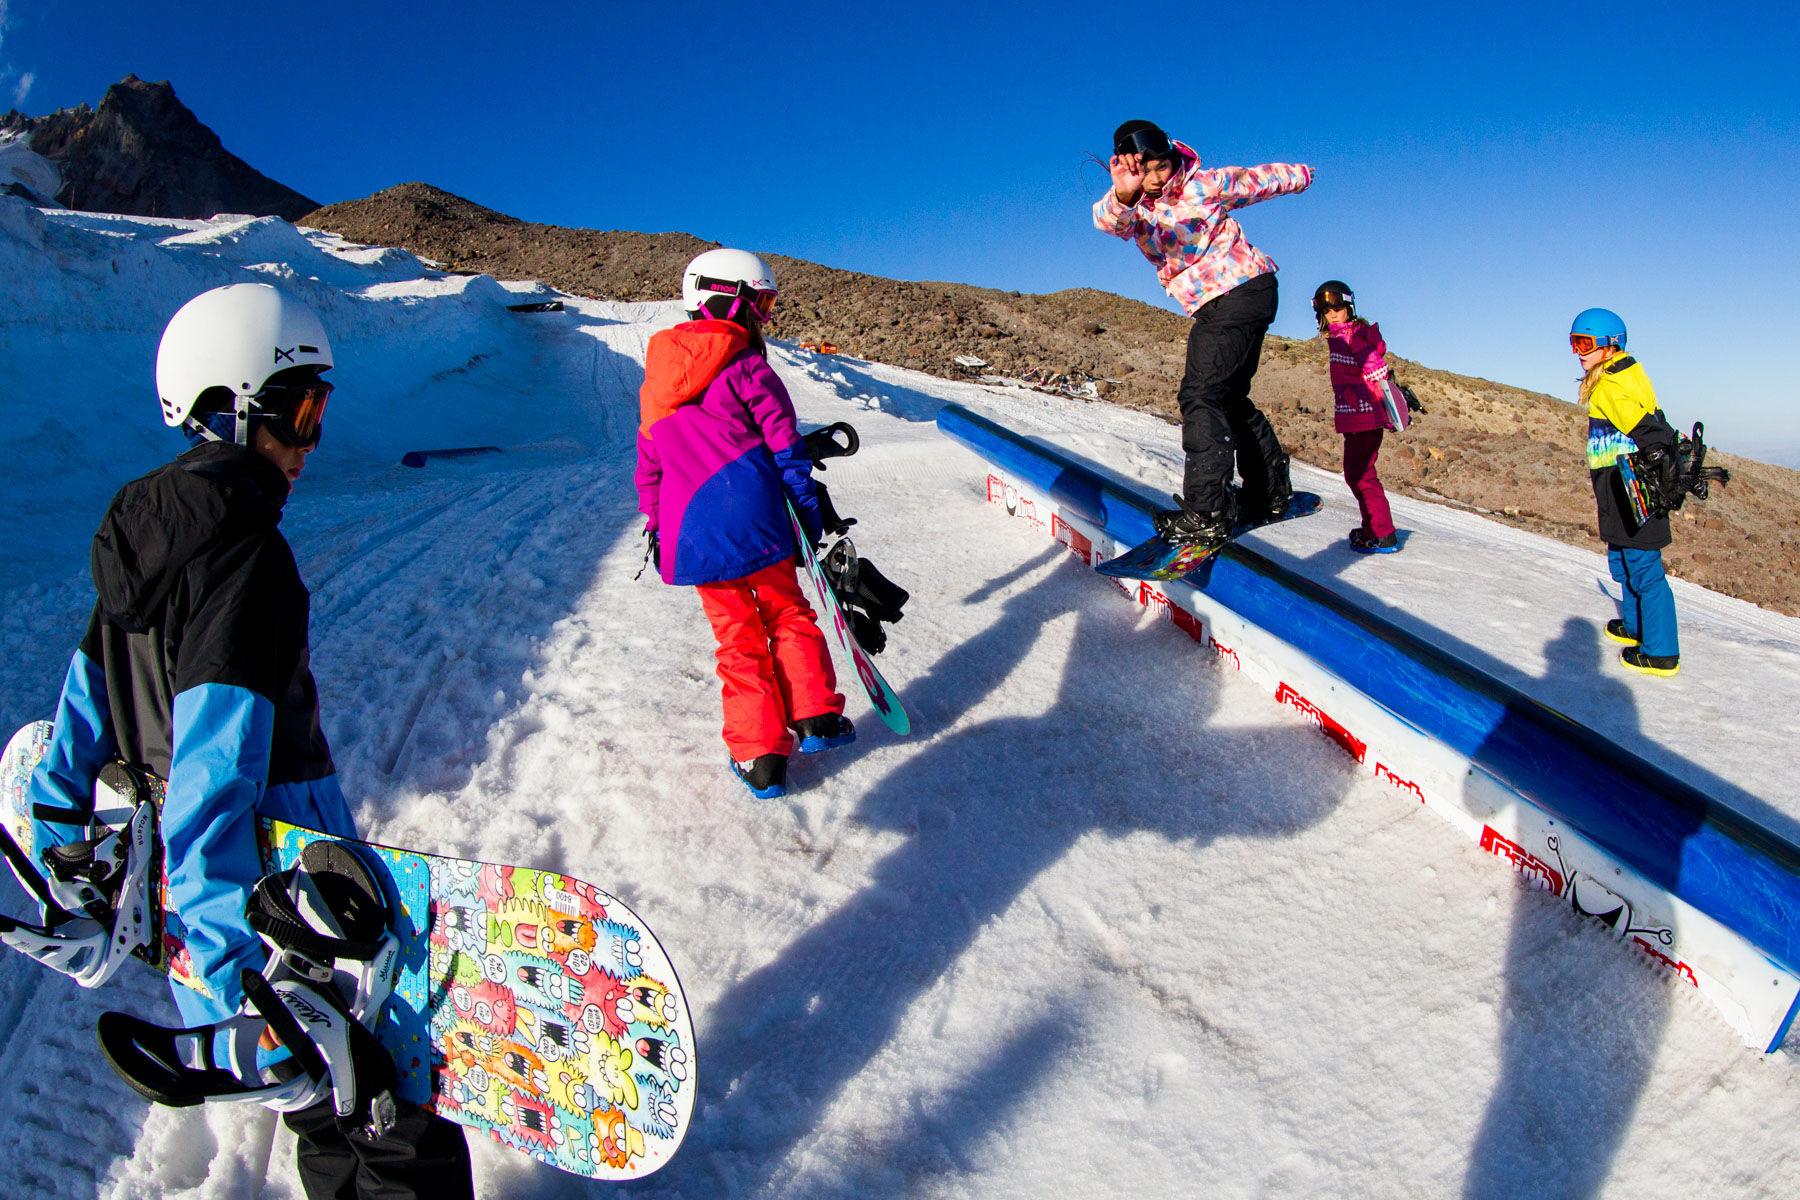 Kid slides down rail on snowboard